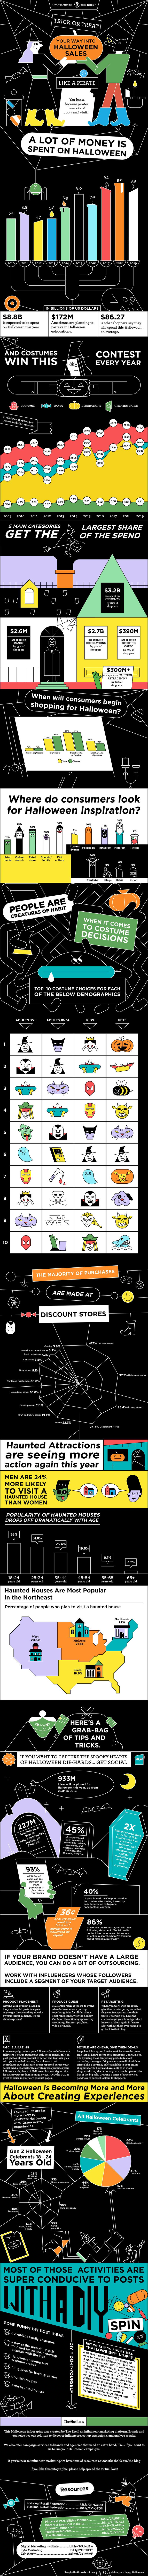 Infographic: Halloween Stats & Sales